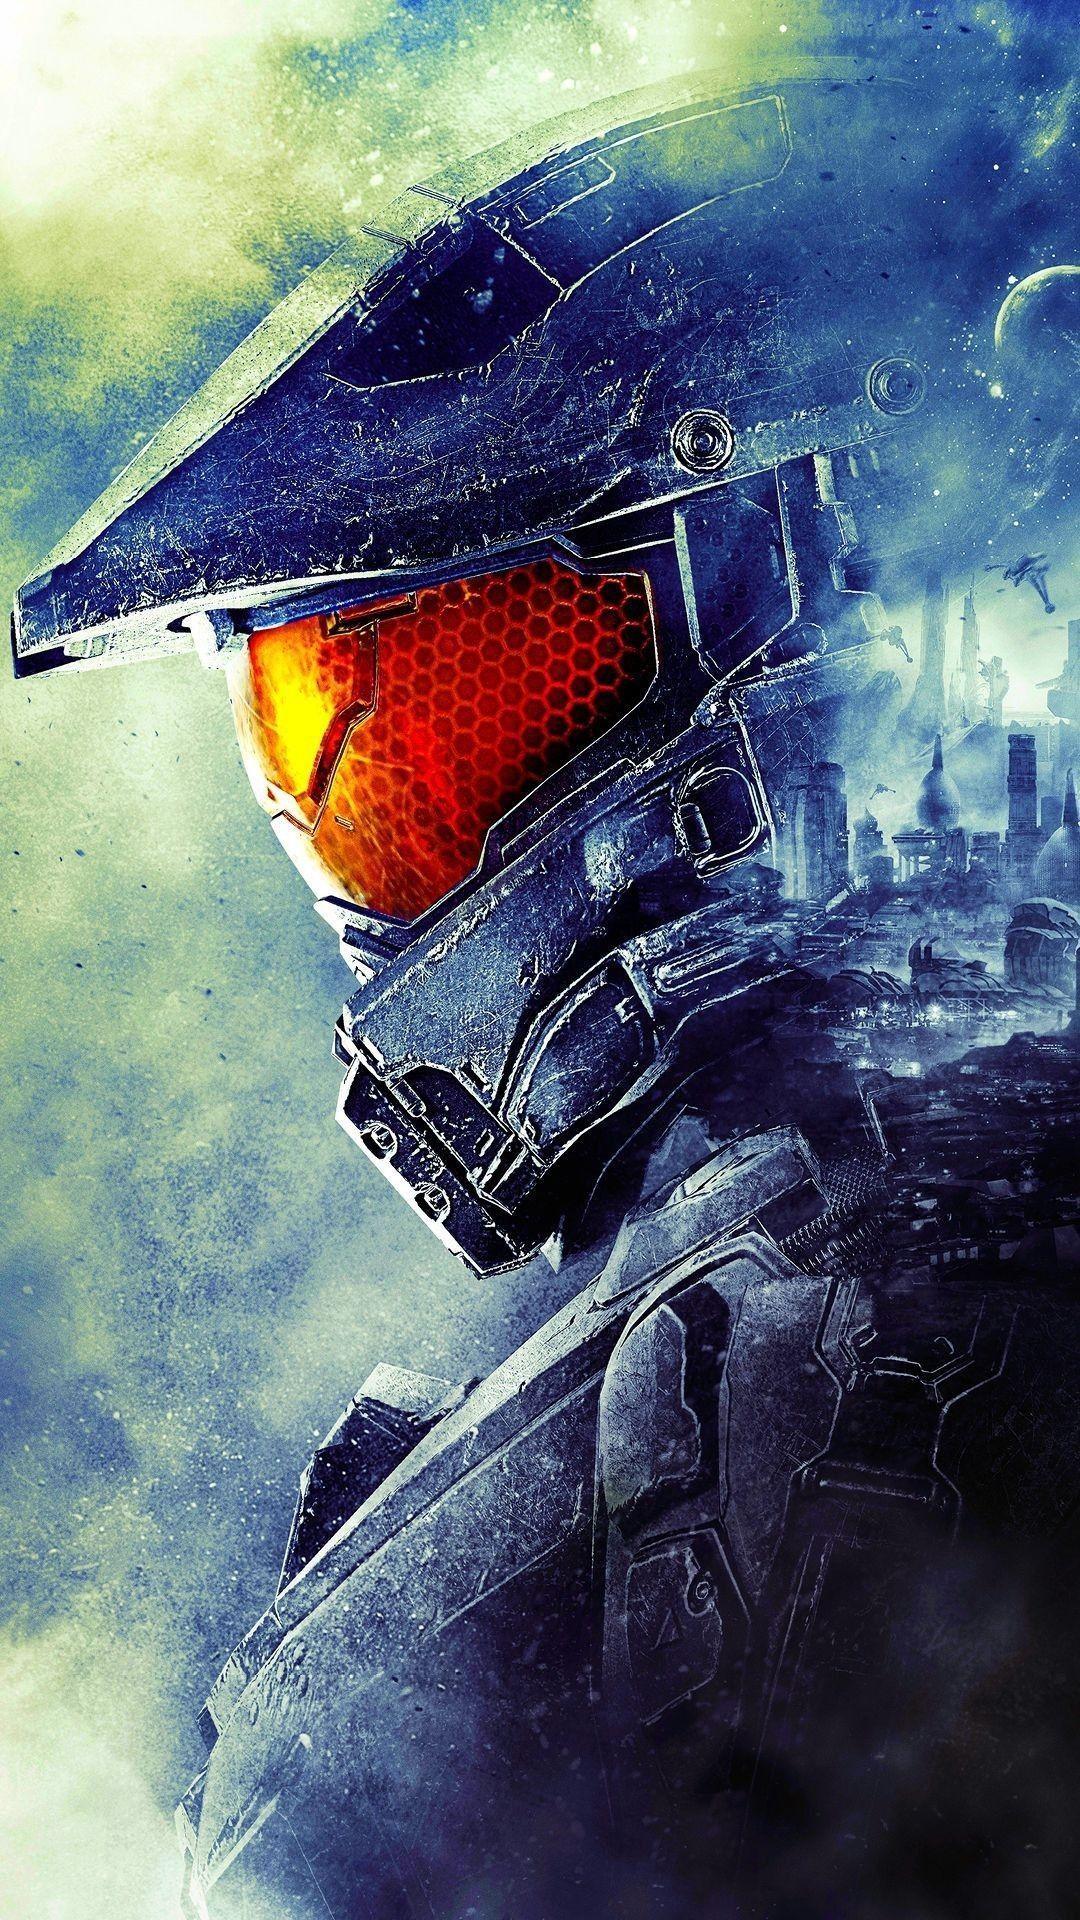 Halo 5 Master Chief Helmet : master, chief, helmet, Badass, Wallpaper, Master, Chief,, Game,, Chief, Helmet